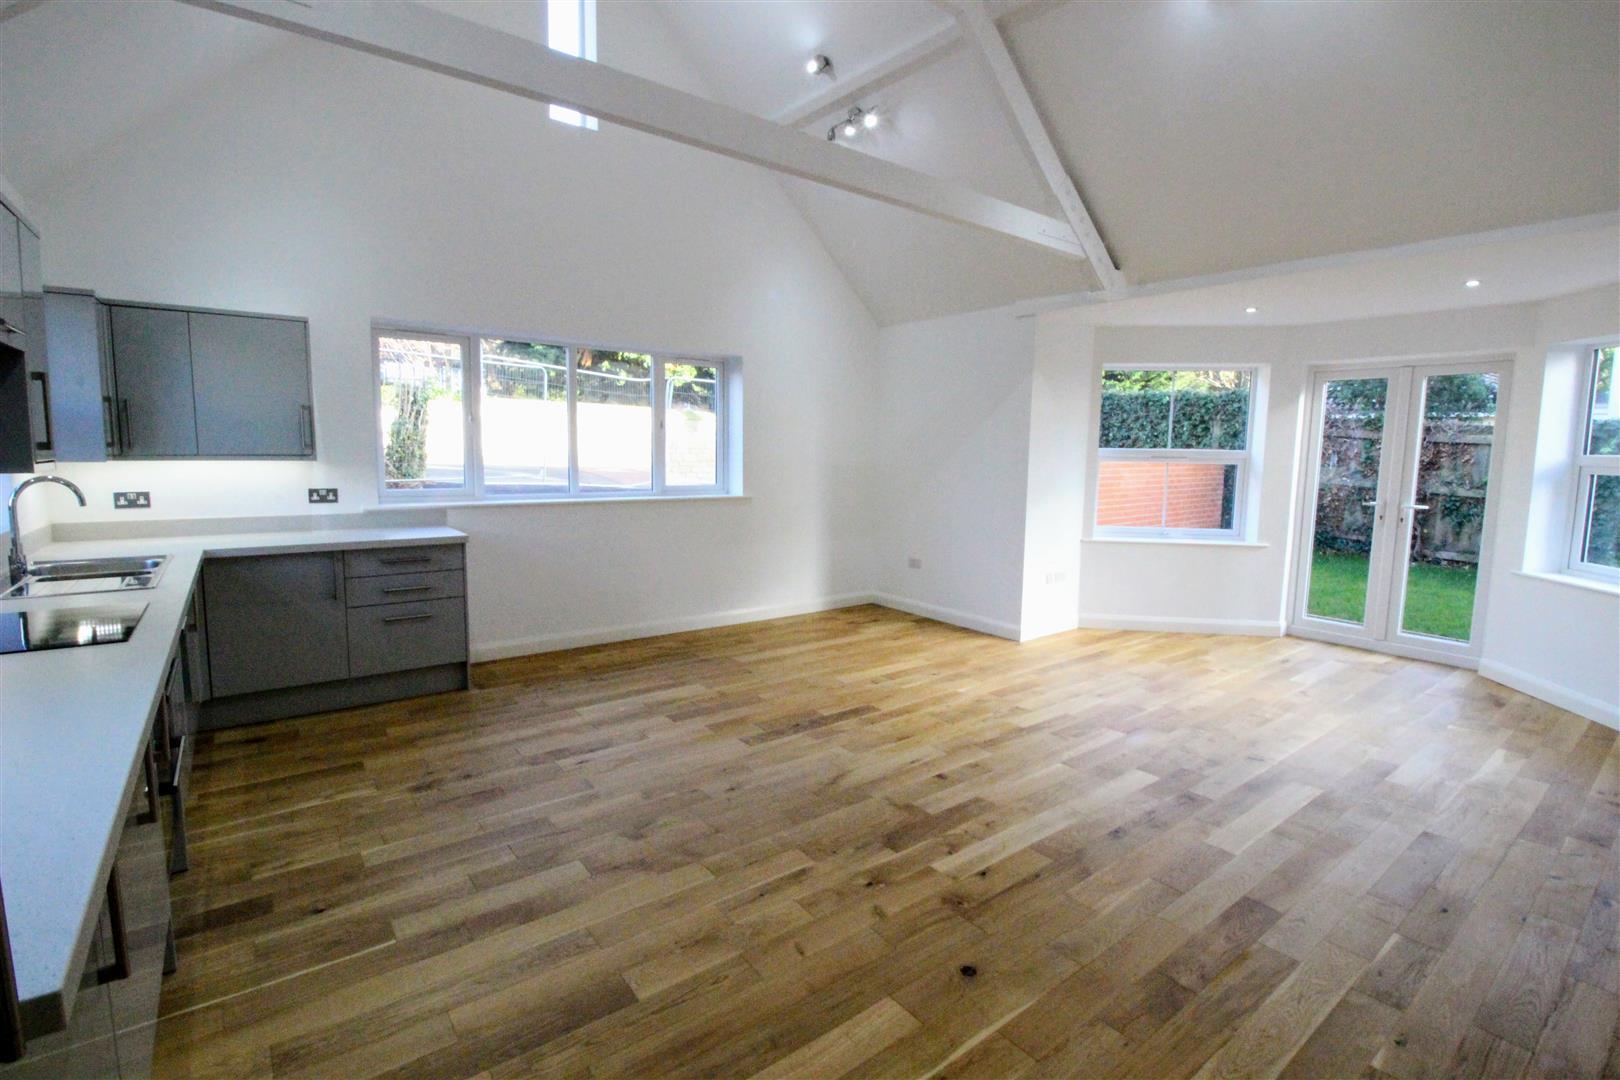 2 Bedrooms Bungalow for sale in Belmont Crescent, Swindon